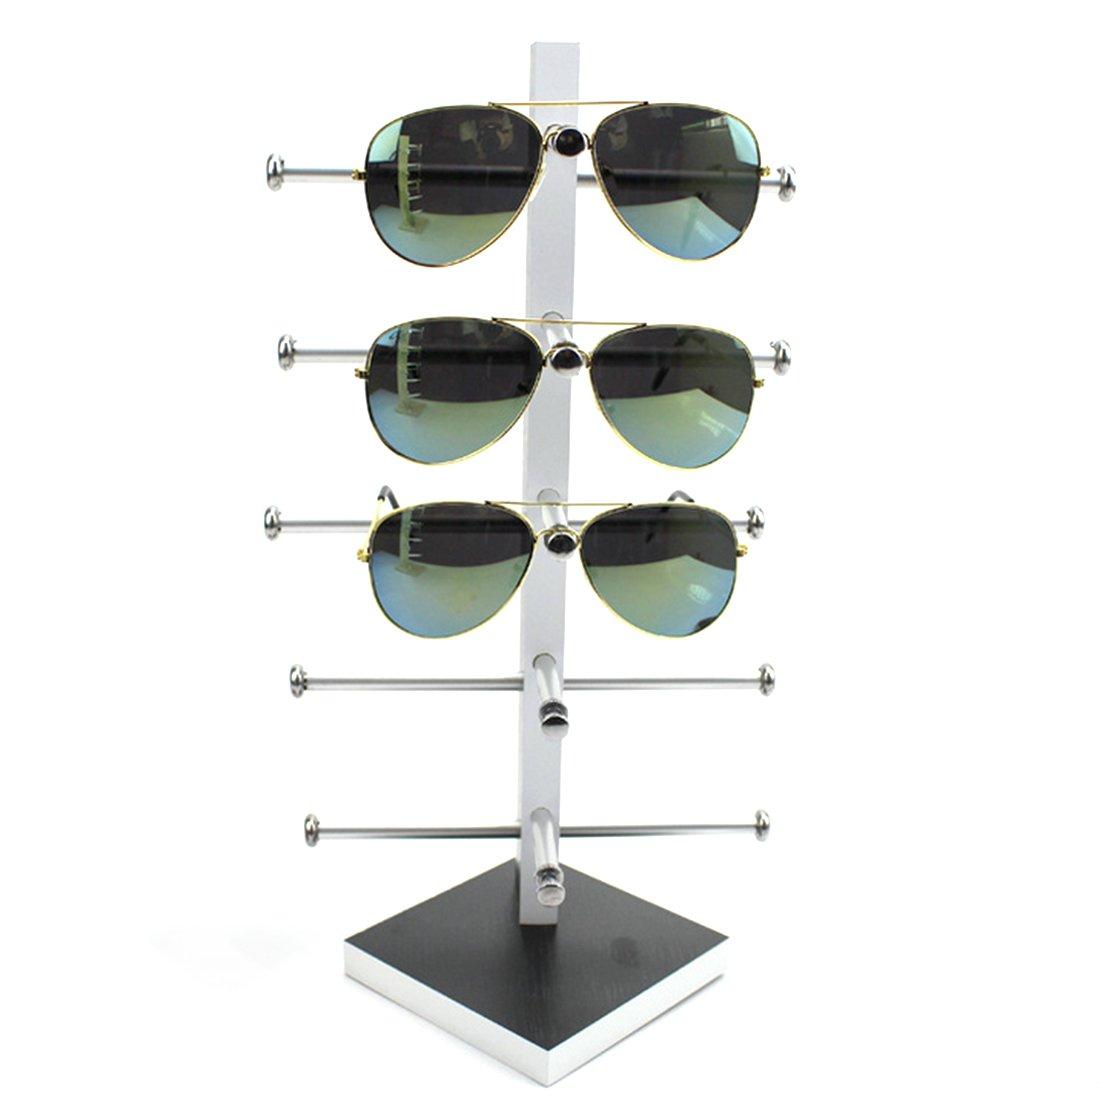 Display Rack, Petforu Wooden Sunglasses Holder Eyeglass Collections Display Stand (Black + White)